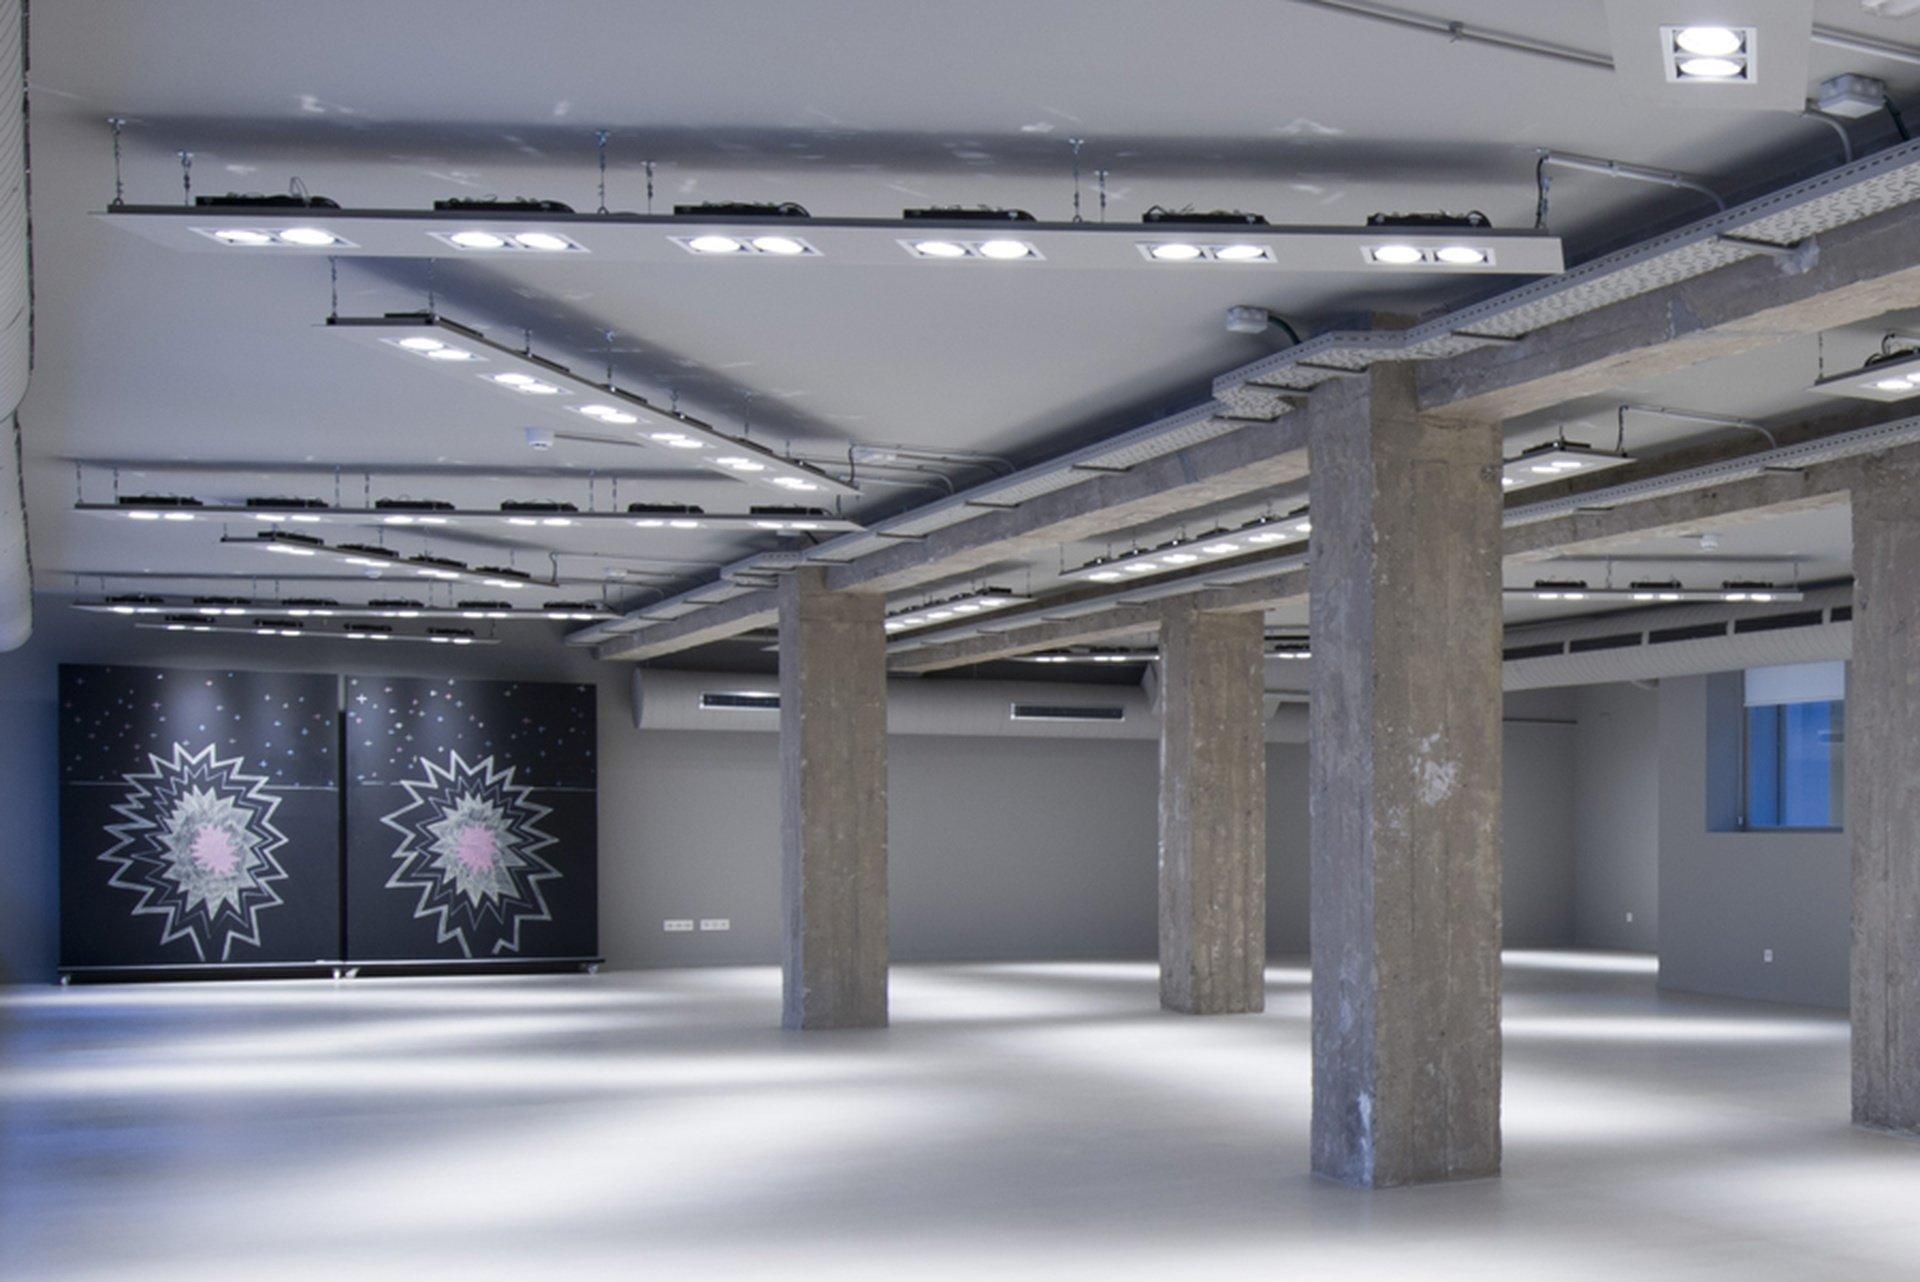 Rest der Welt corporate event venues Meetingraum Yimby Bilbao - My image 0